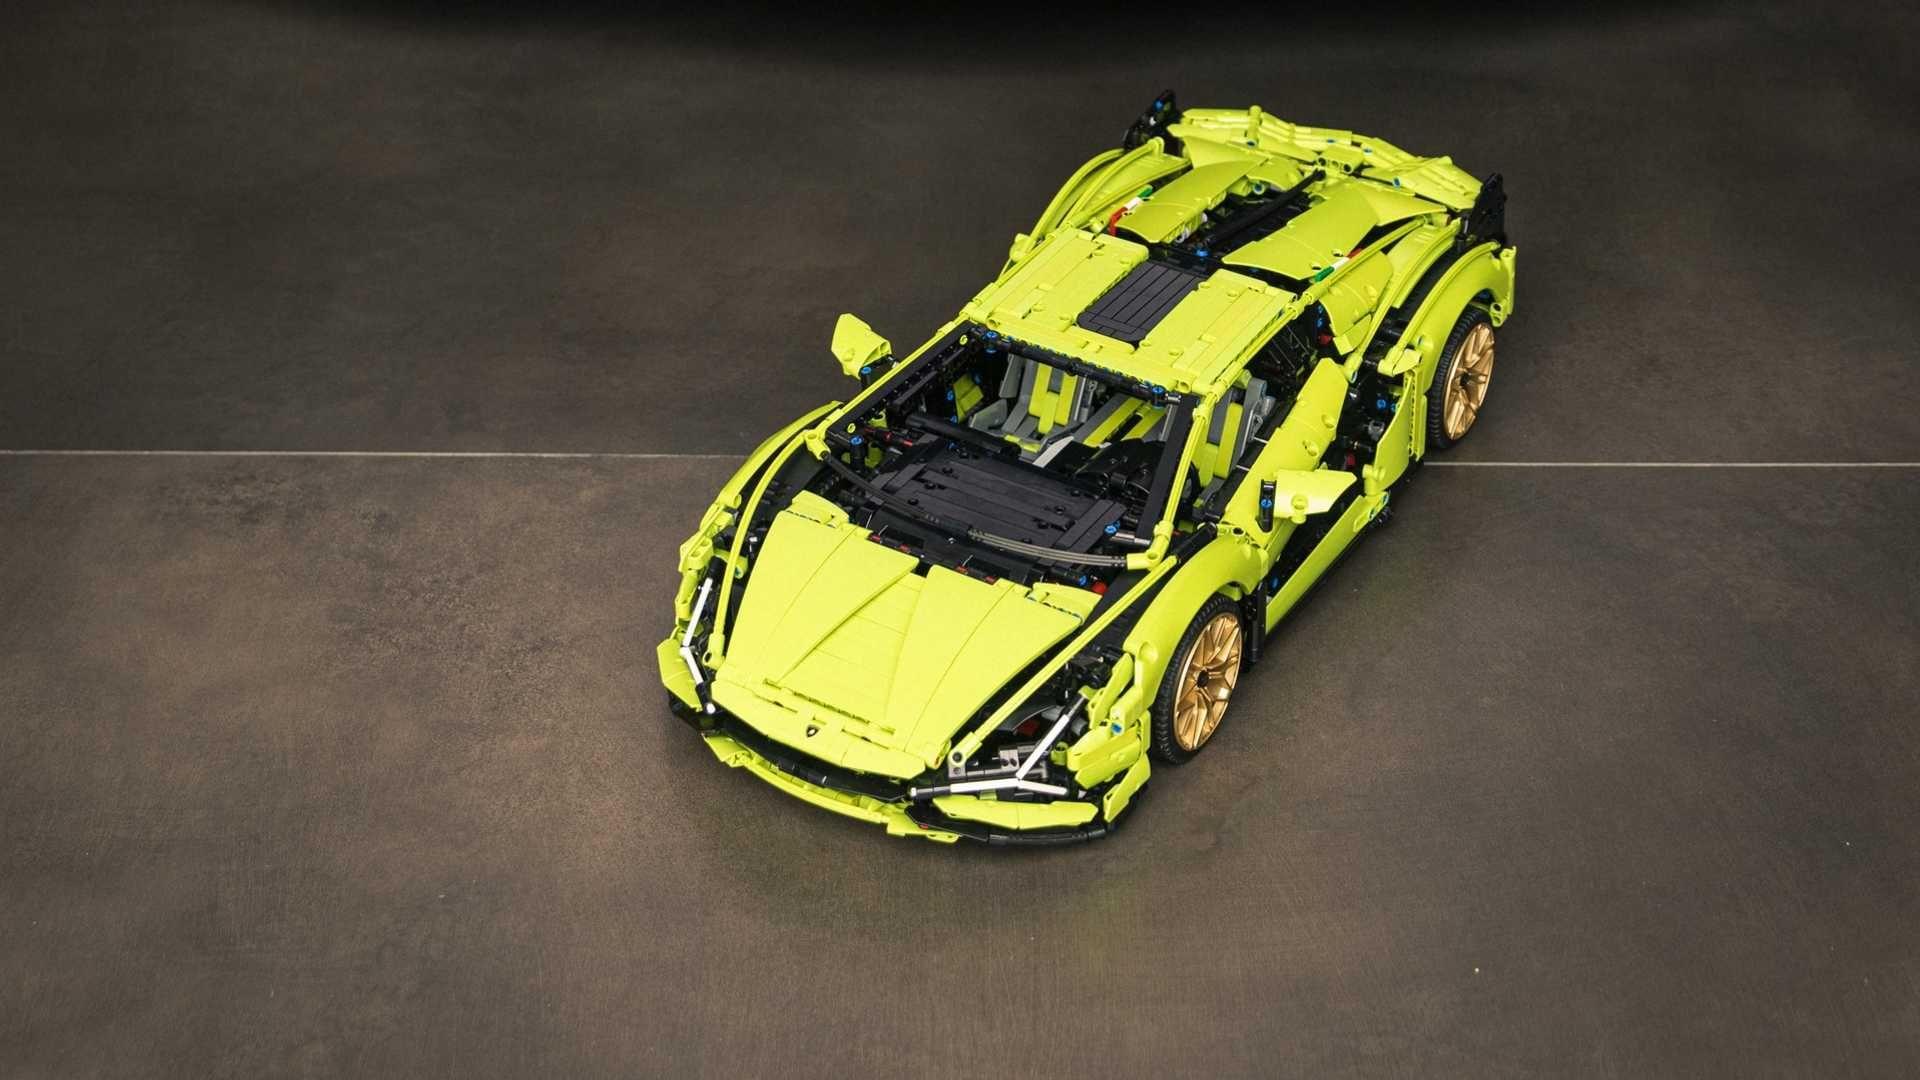 Lamborghini-Sian-FKP-37-Lego-Technic-16